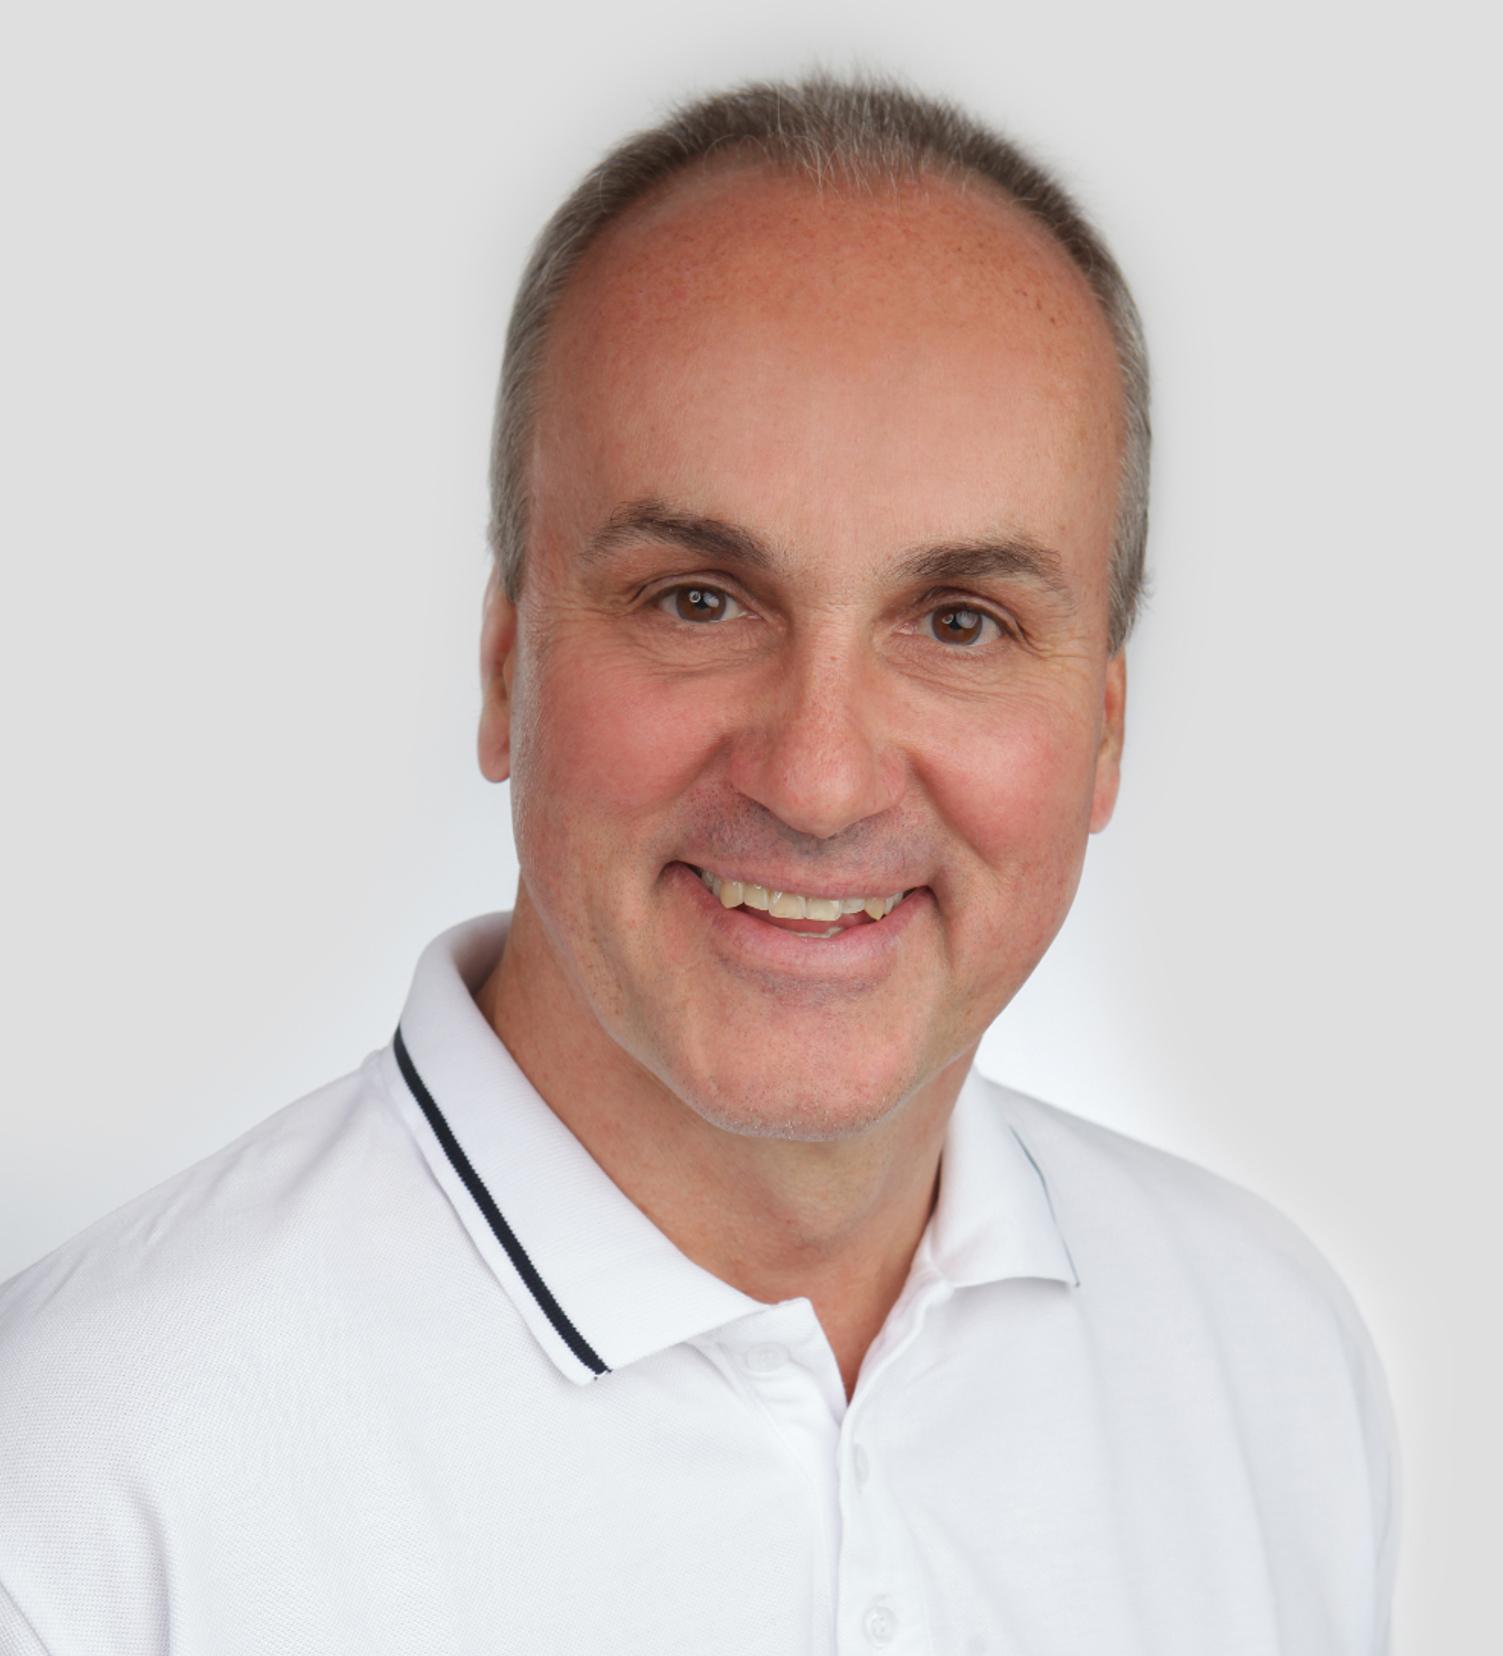 Dr. Tobias Wieser